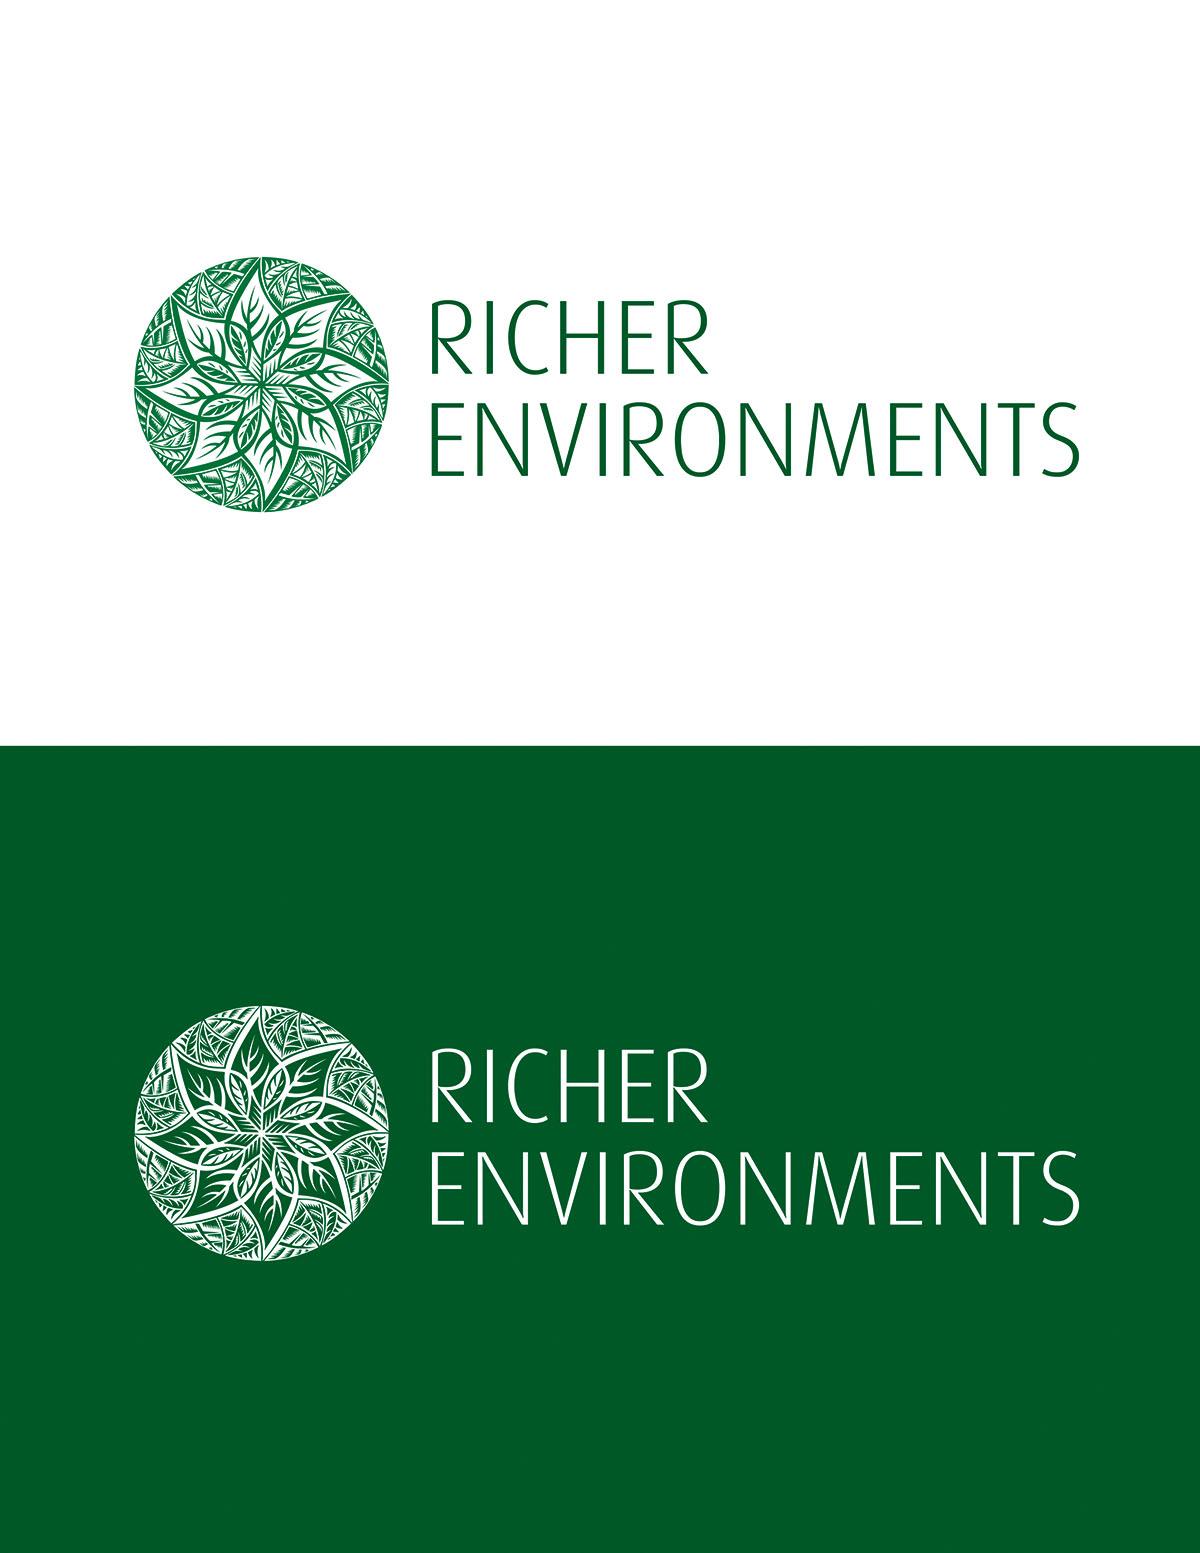 Logo Design by Joel Policarpio - Entry No. 8 in the Logo Design Contest Unique Logo Design Wanted for Richer Environments.